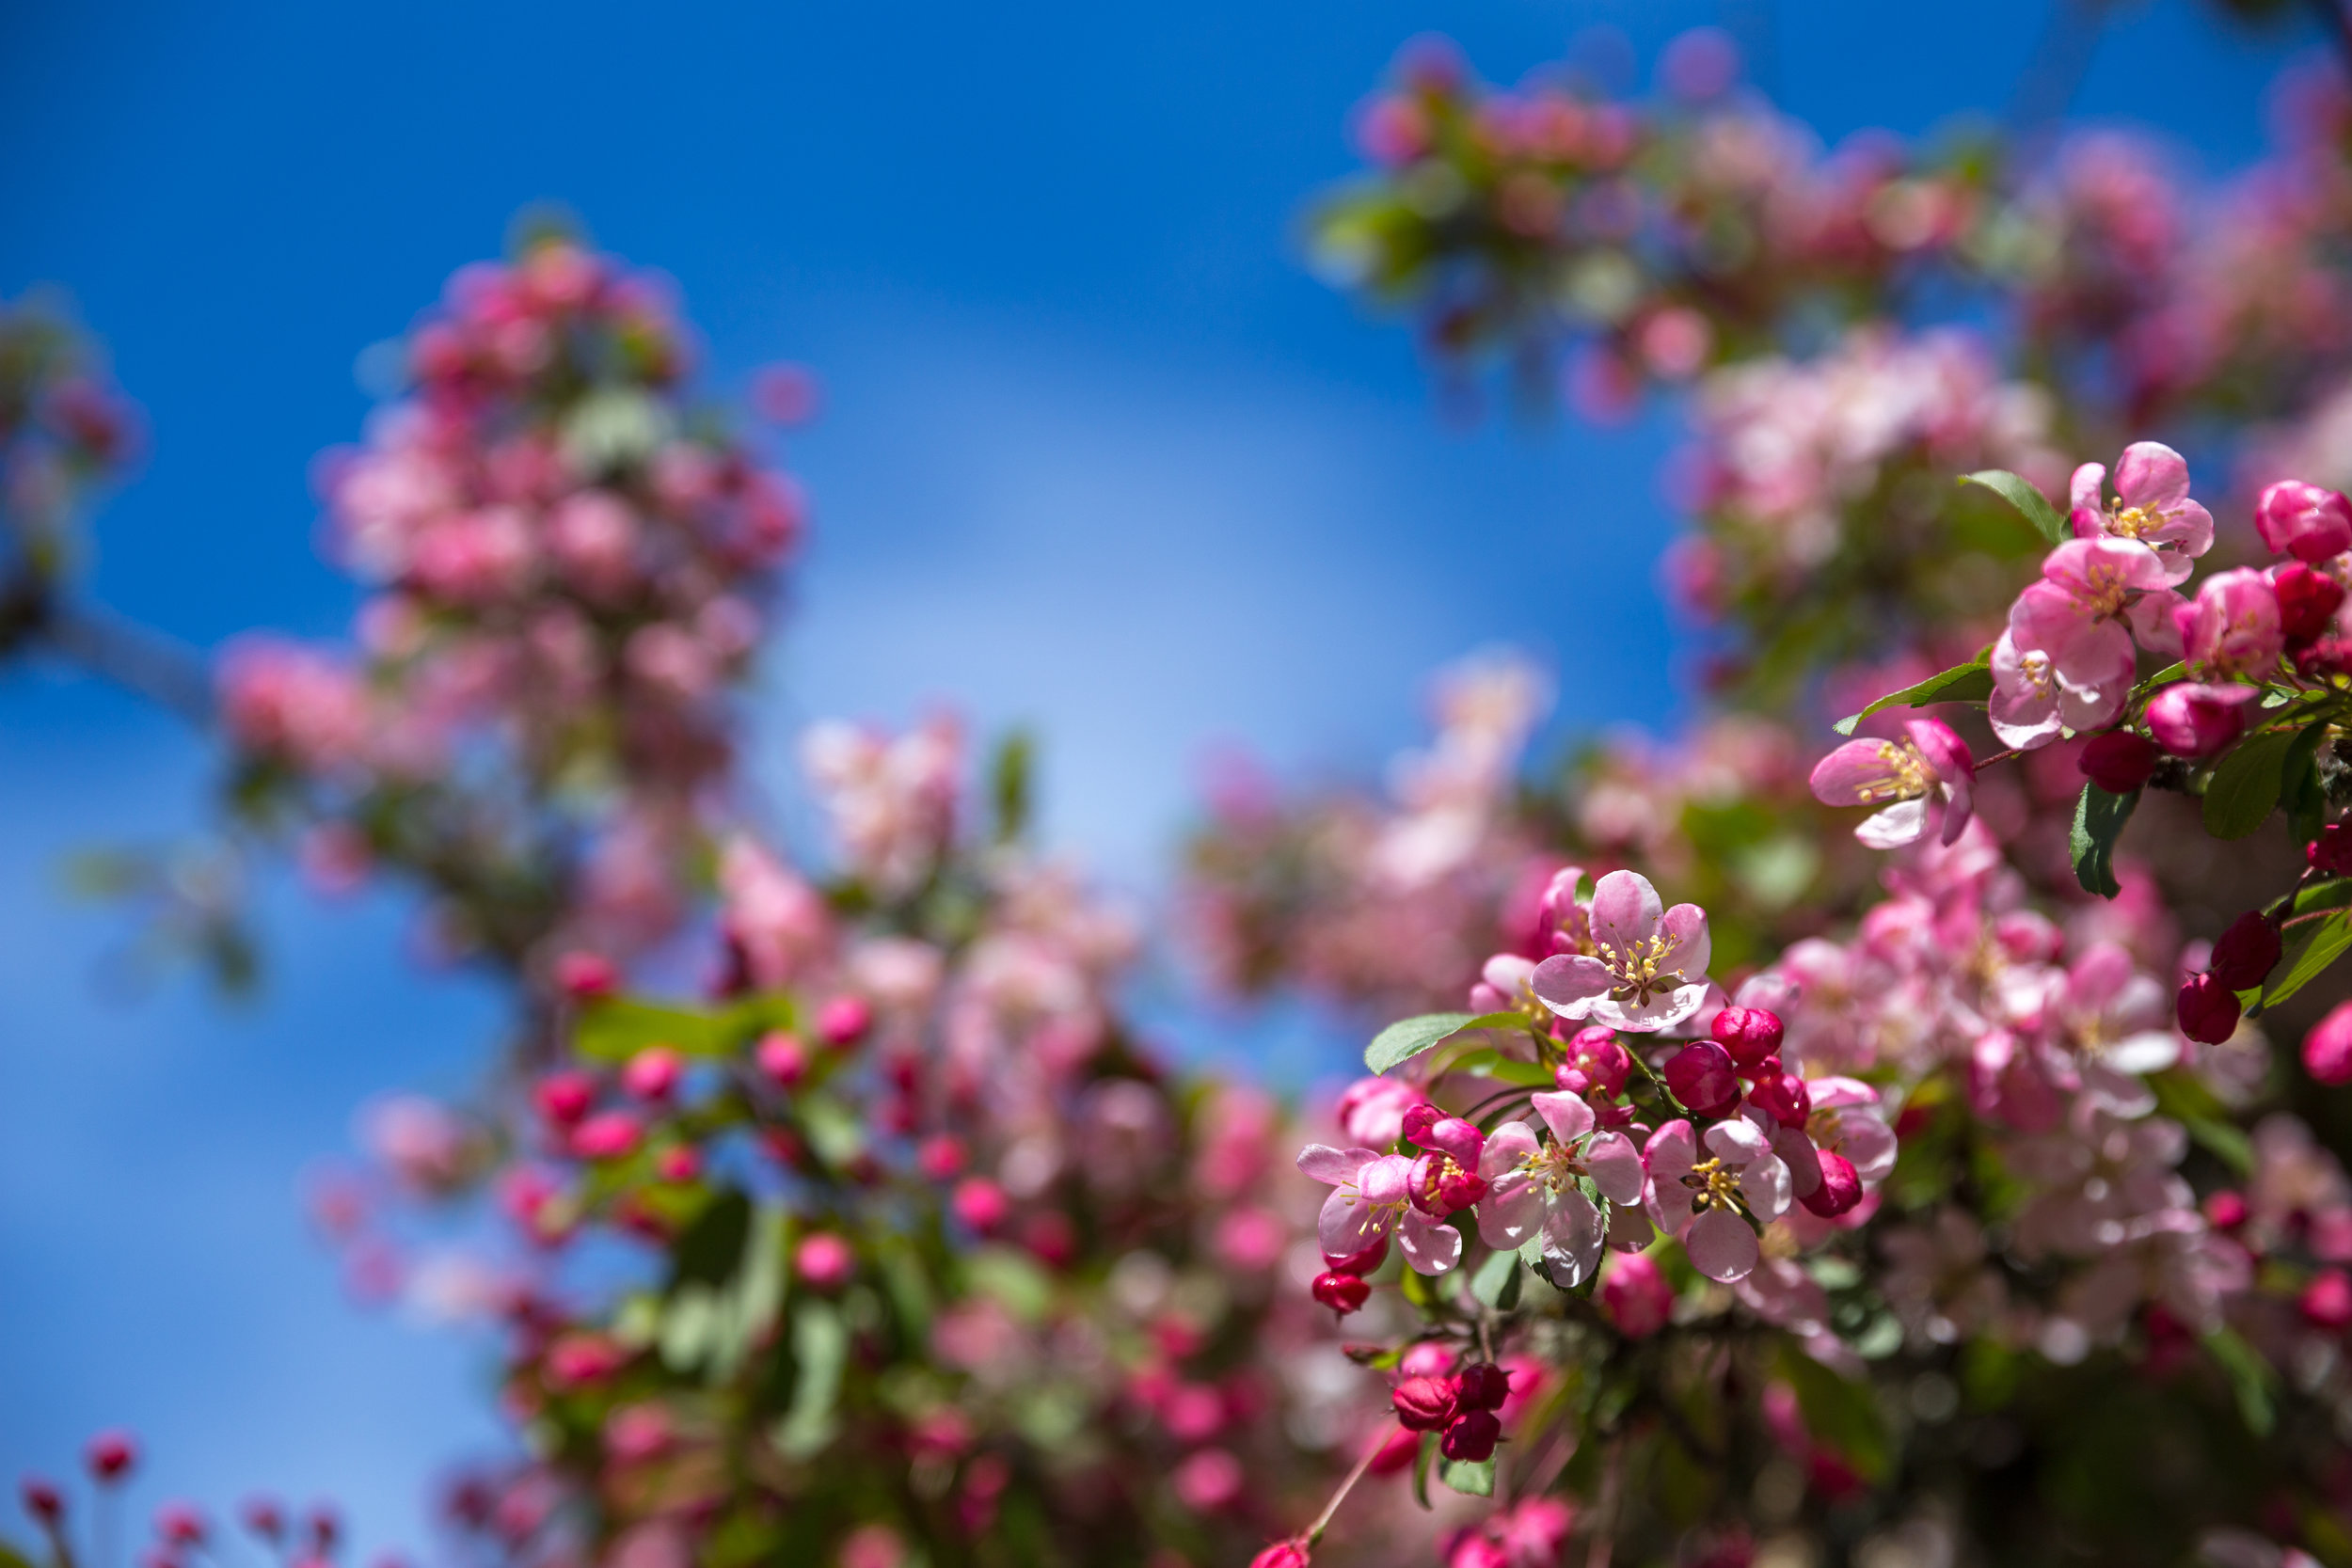 4 april 12th 2018 point defiance flowers flowering trees 5 stars-77.jpg